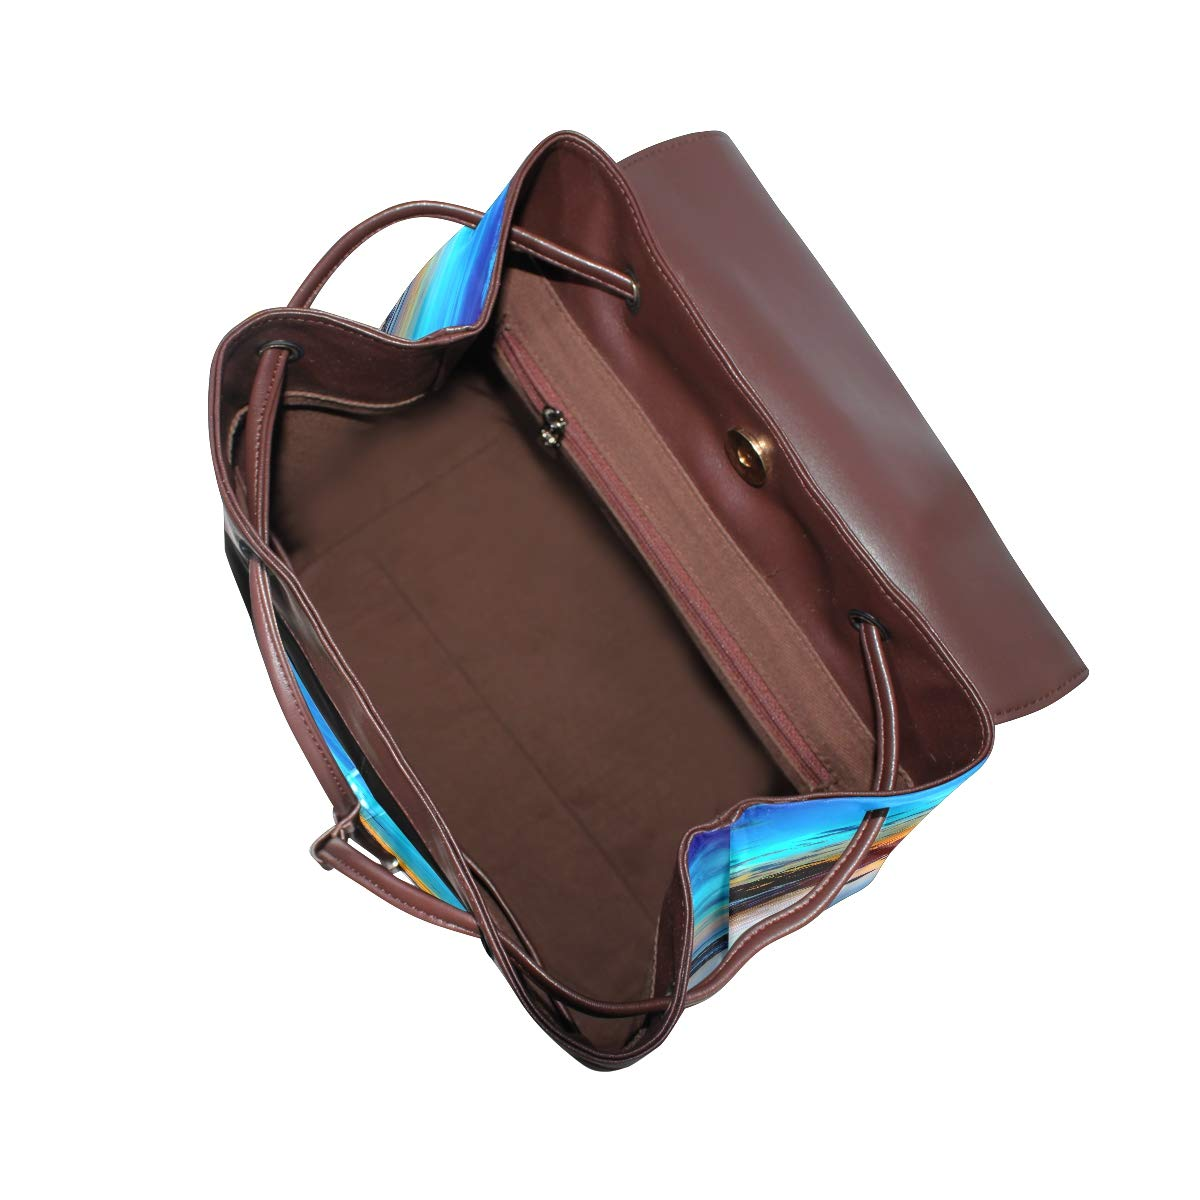 KEAKIA Women PU Leather Morning Sunrise Backpack Purse Travel School Shoulder Bag Casual Daypack